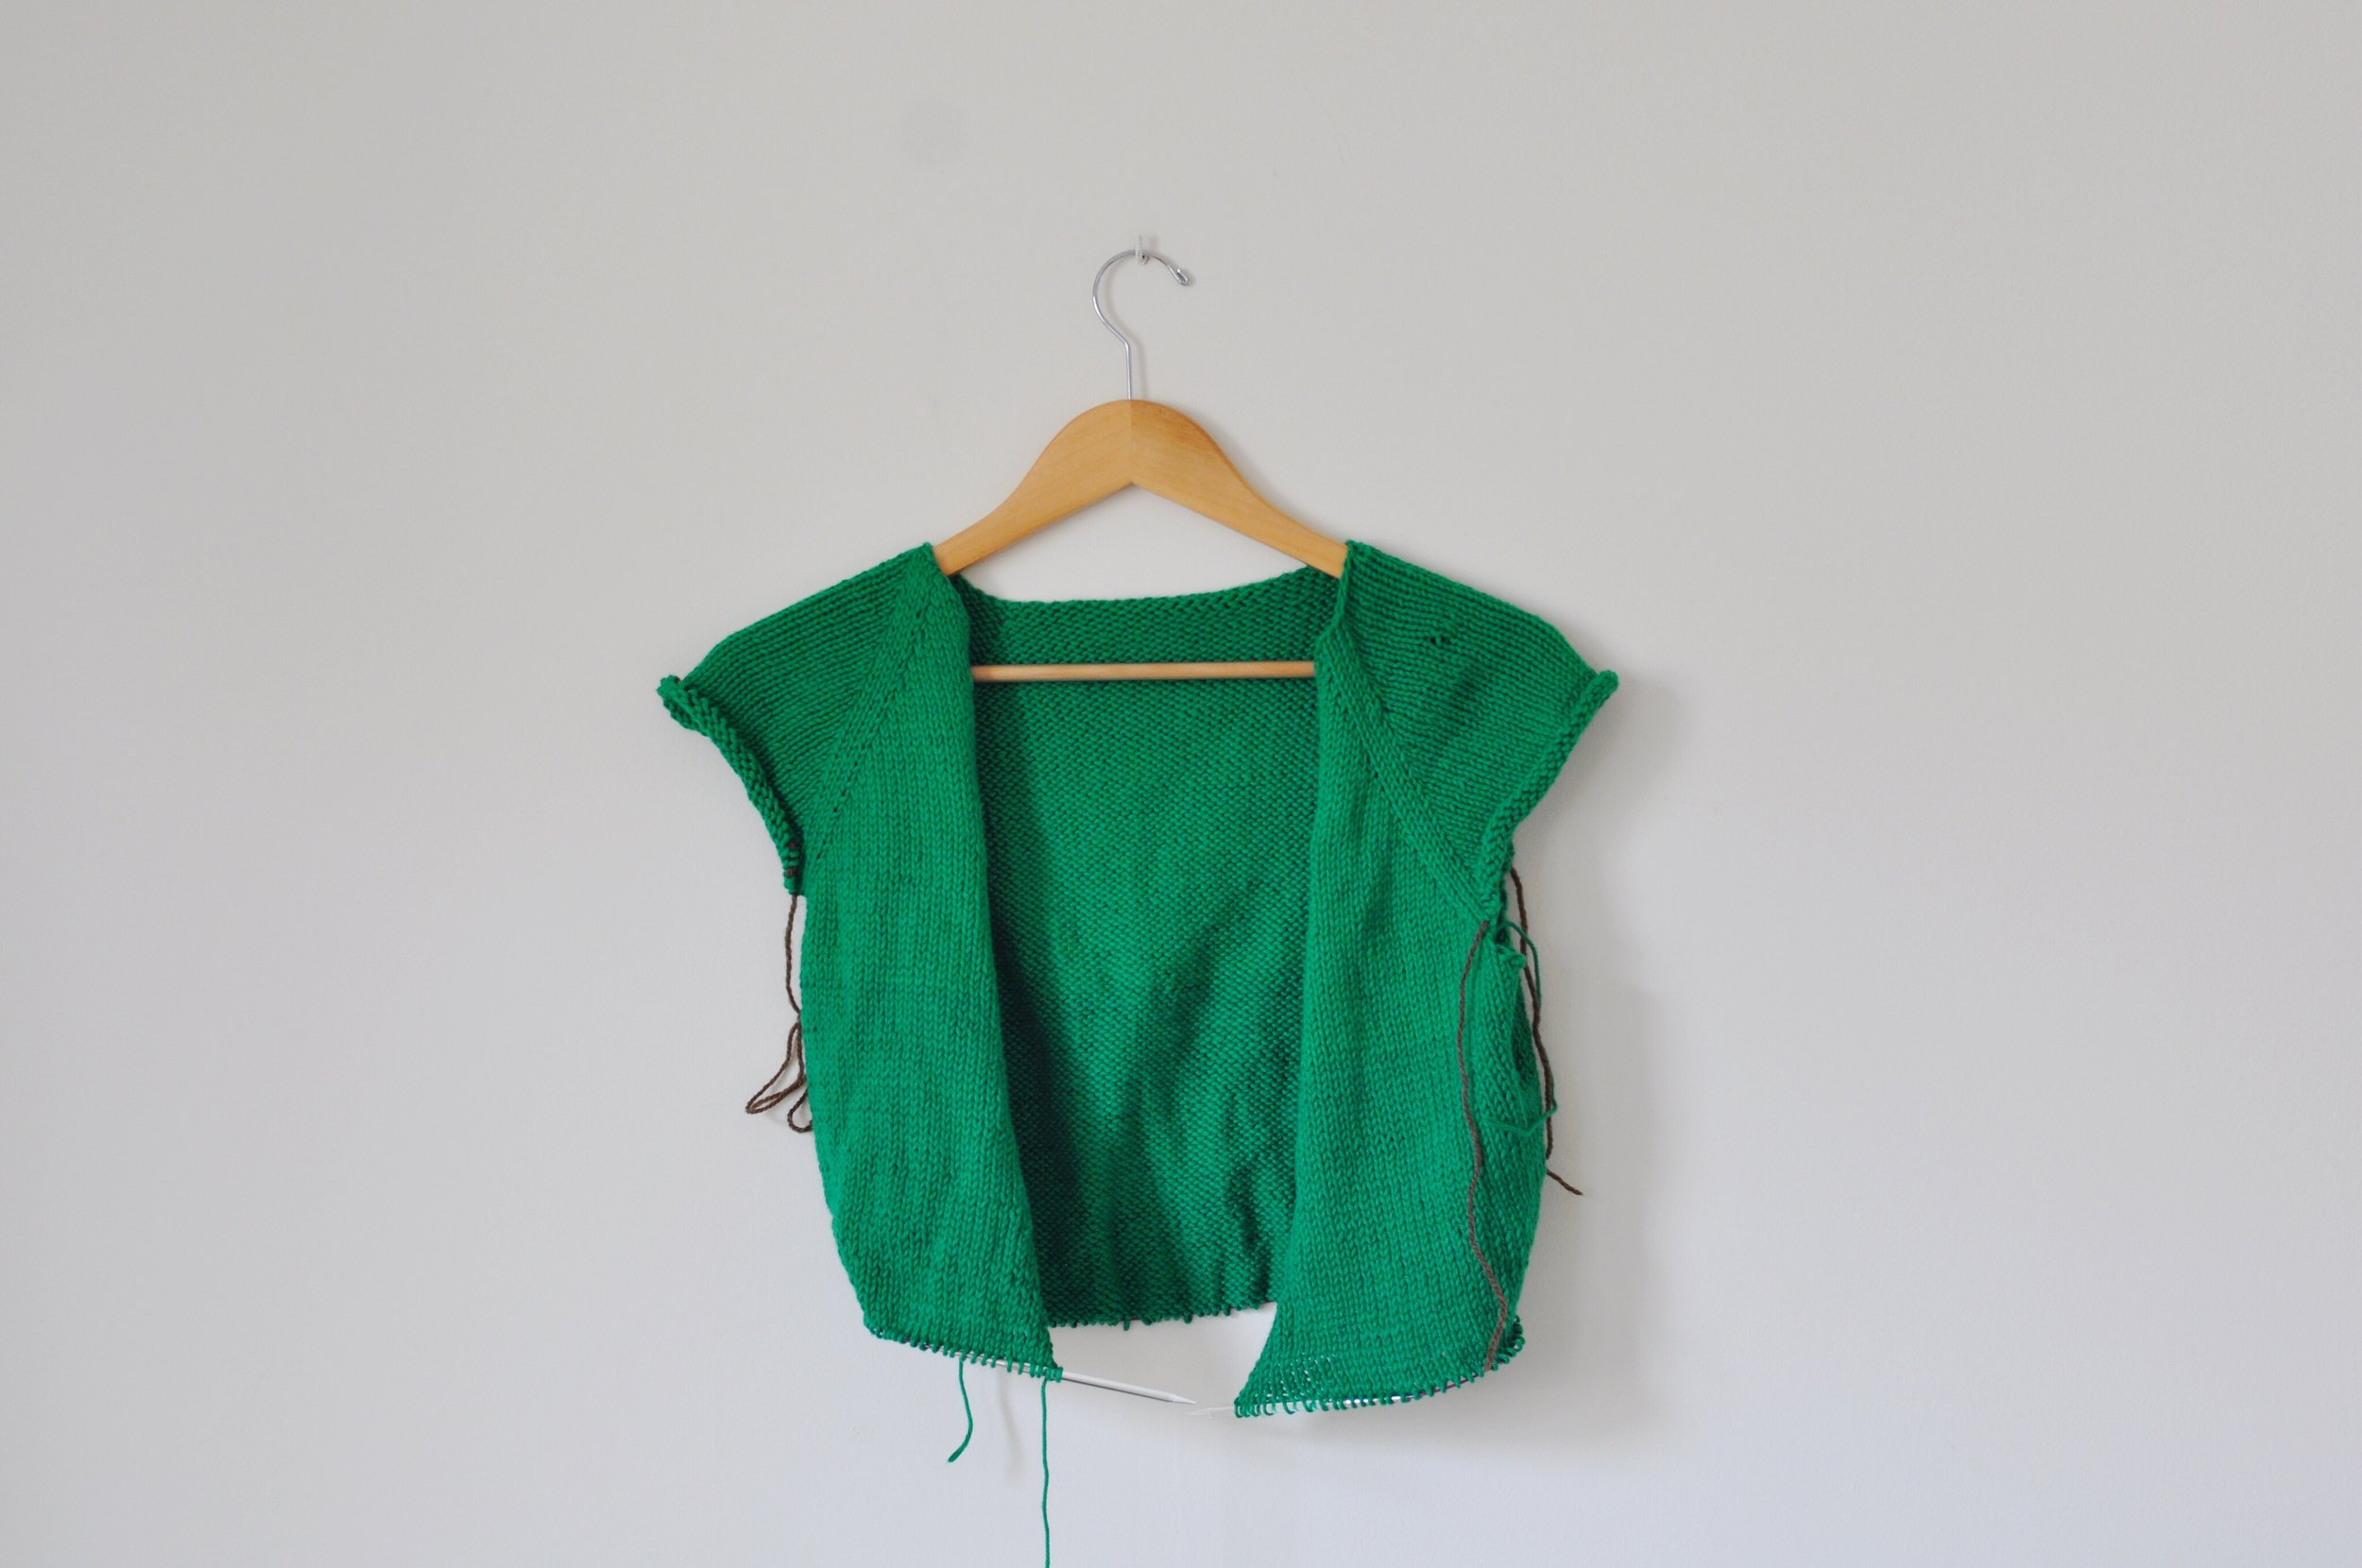 Green cardigan sweater knitting in progress